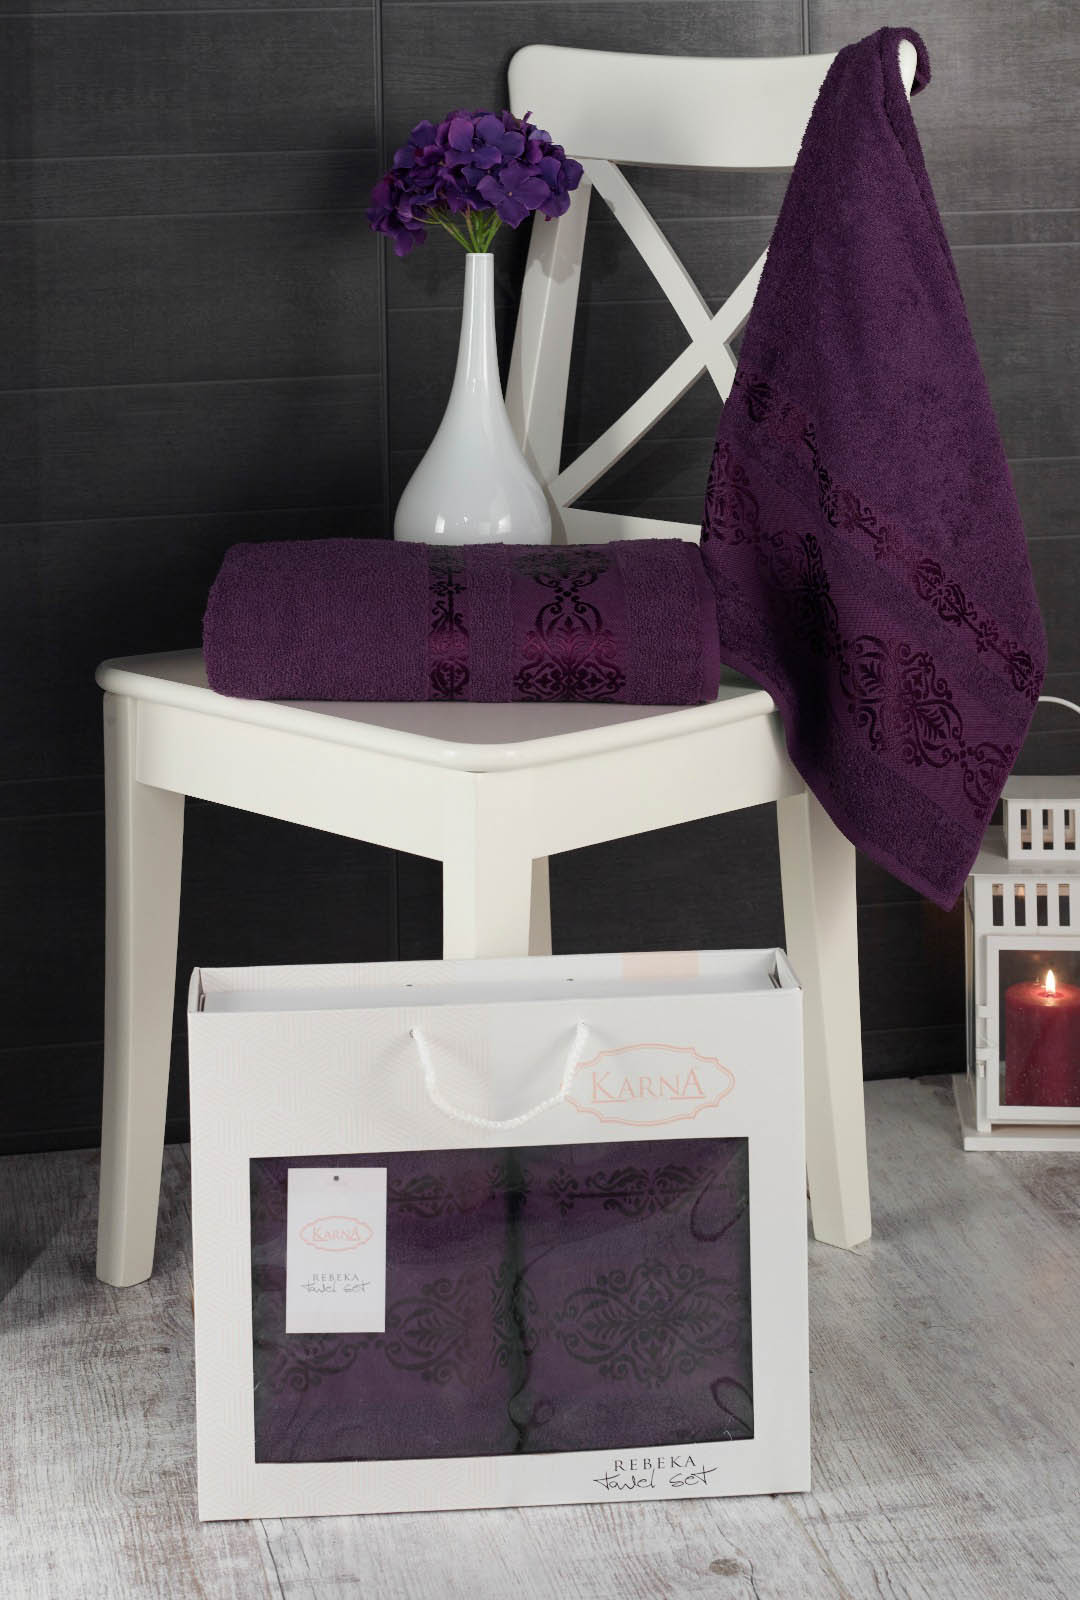 Полотенца Karna Полотенце Rebeca Цвет: Фиолетовый (50х90 см,70х140 см) набор из 3 полотенец merzuka sakura 50х90 2 70х140 8432 терракотовый